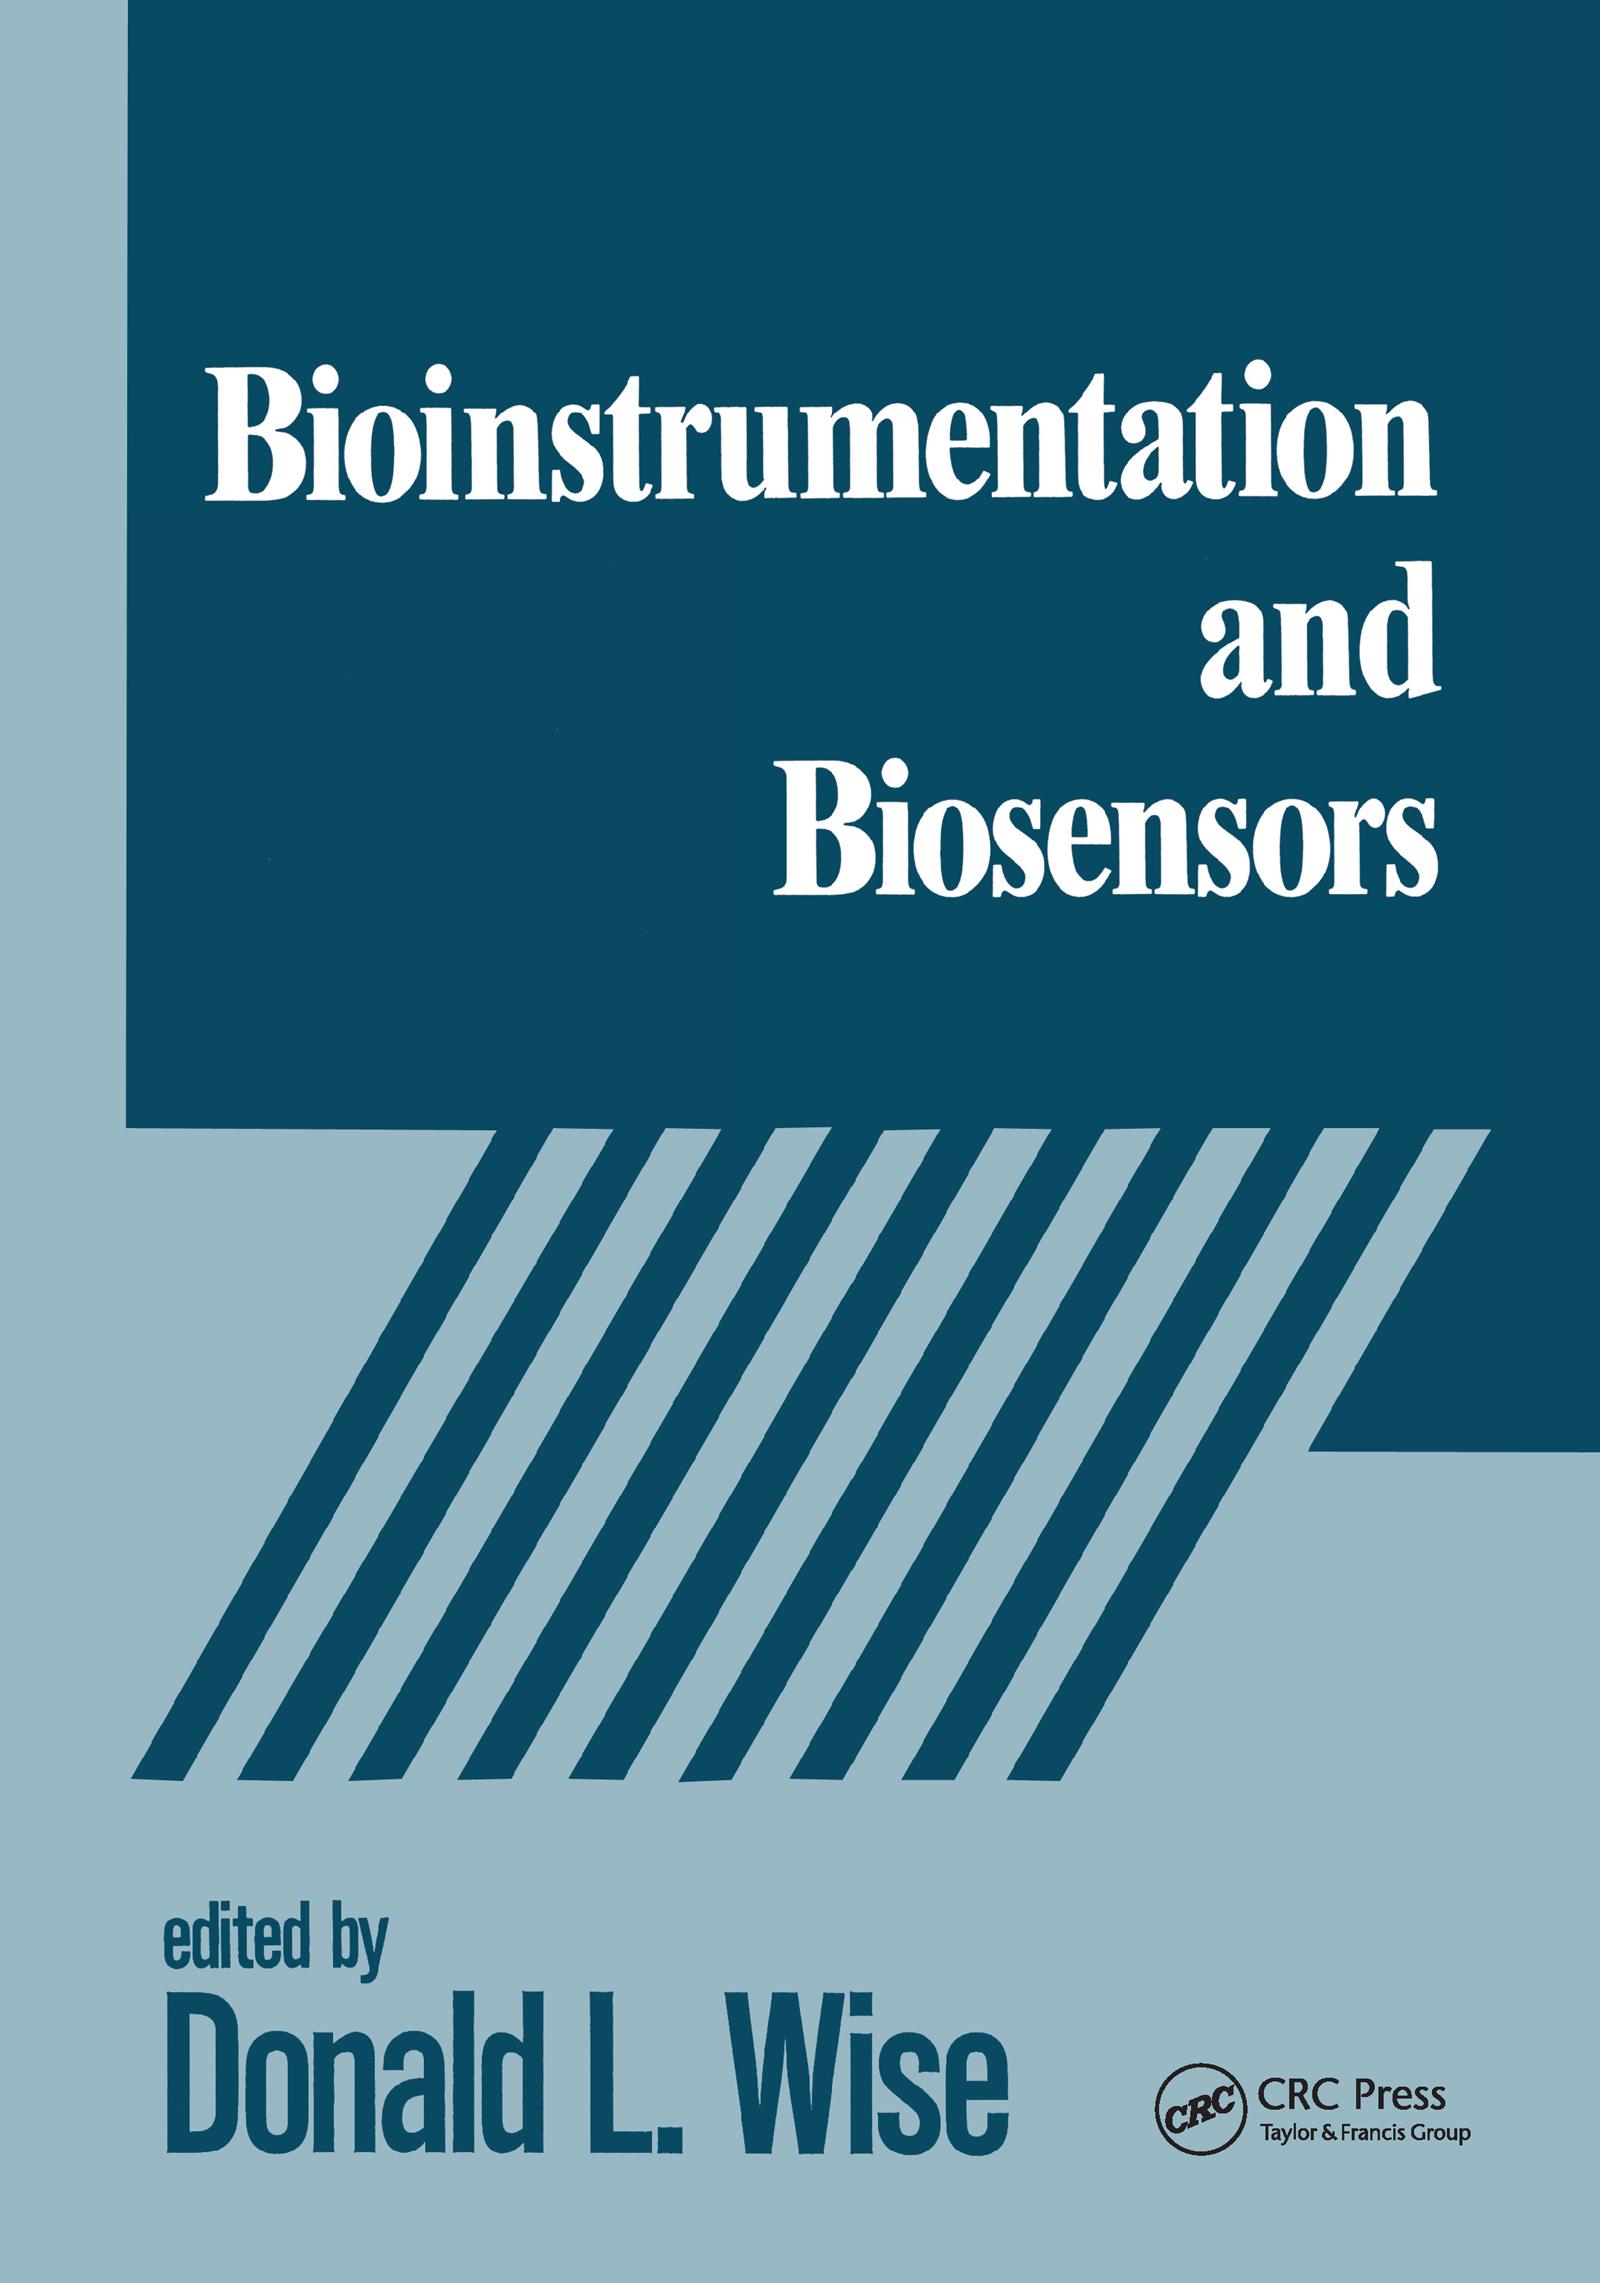 Bioinstrumentation and Biosensors: 1st Edition (Hardback) book cover